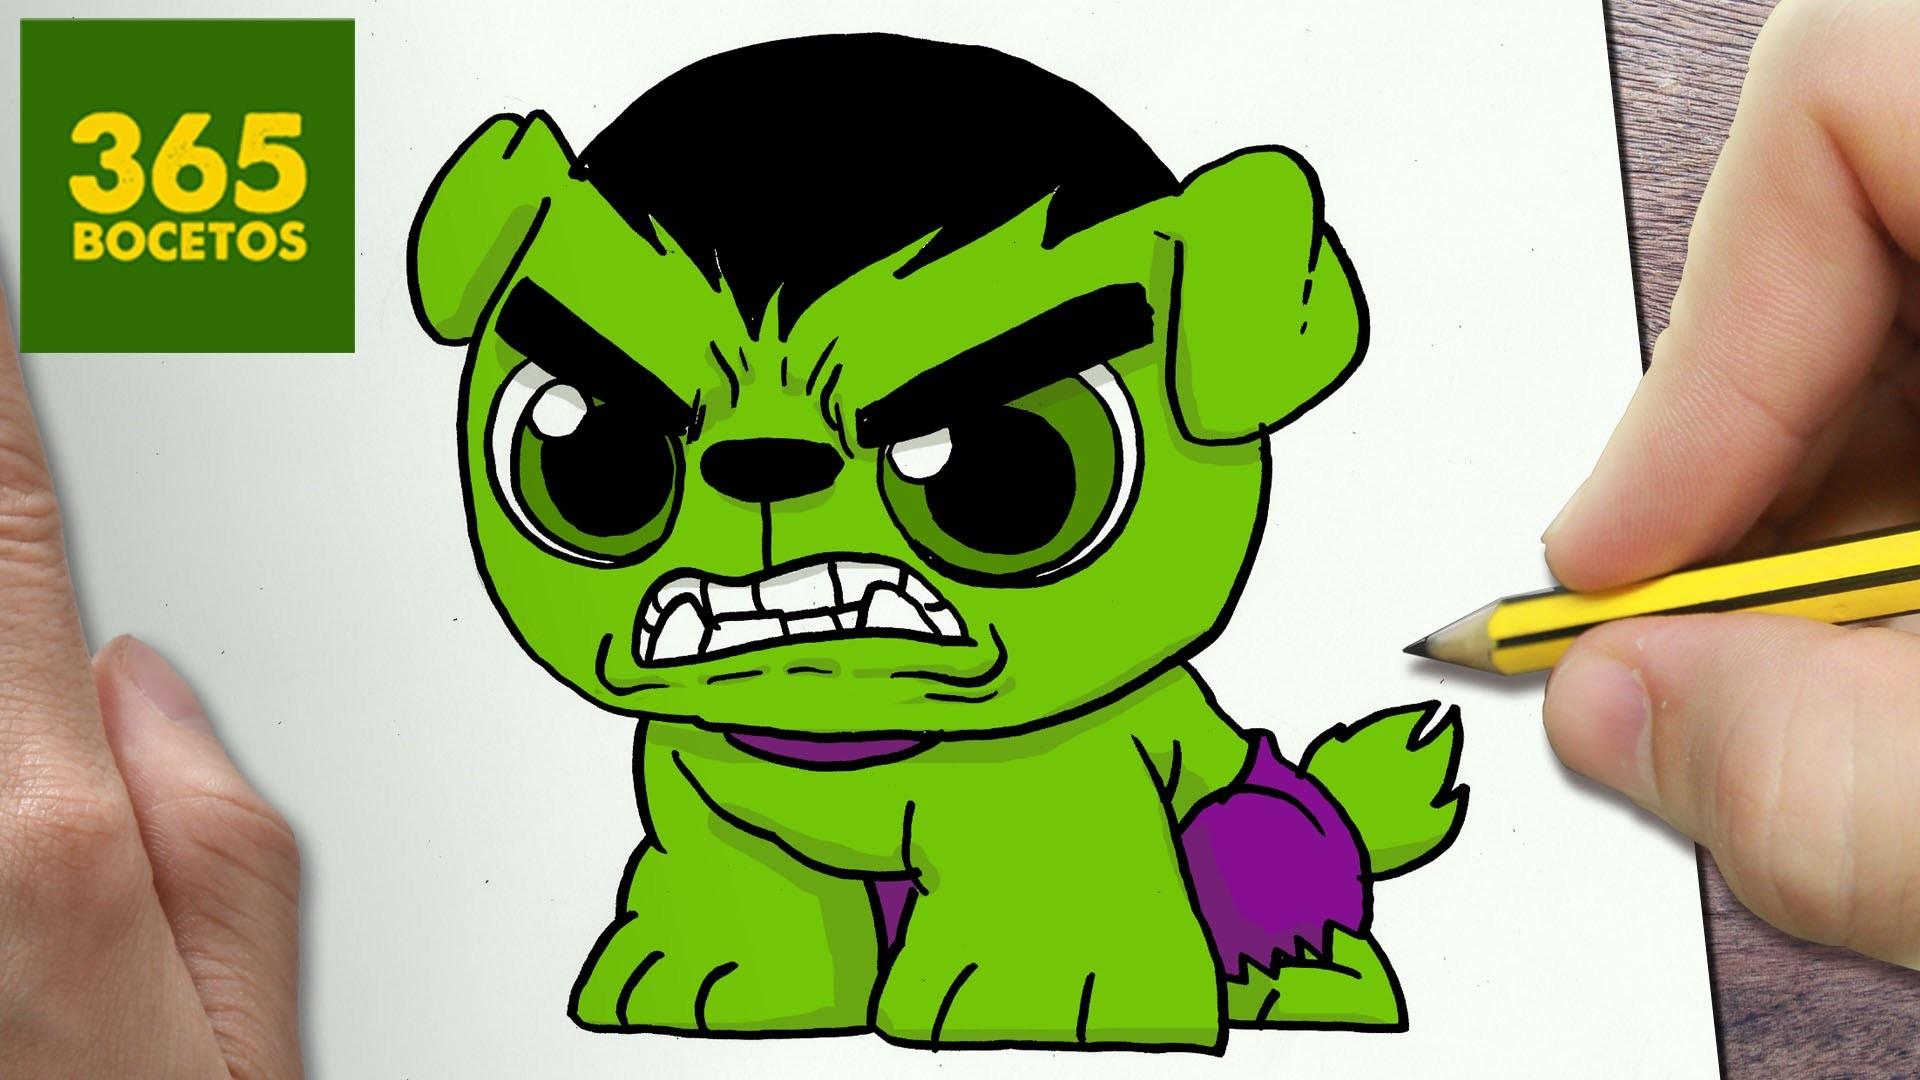 Como Dibujar Un Perro Hulk Kawaii Paso A Paso Dibujos Kawaii